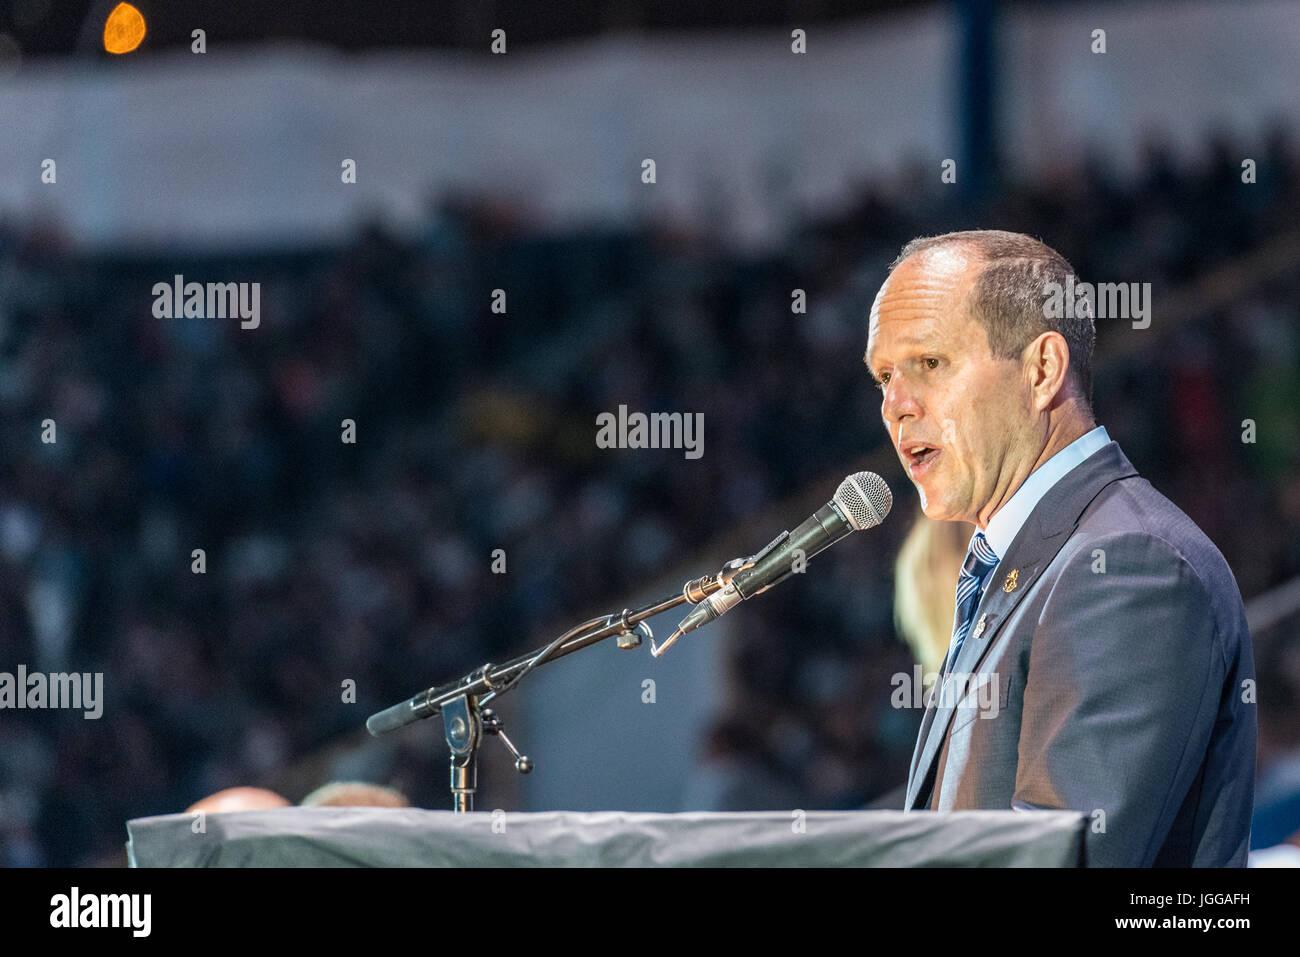 Jerusalem, Israel. 6th July, 2017. Opening ceremony of the 20th Maccabiah games - Nir Barkat mayor of Jerusalem - Stock Image